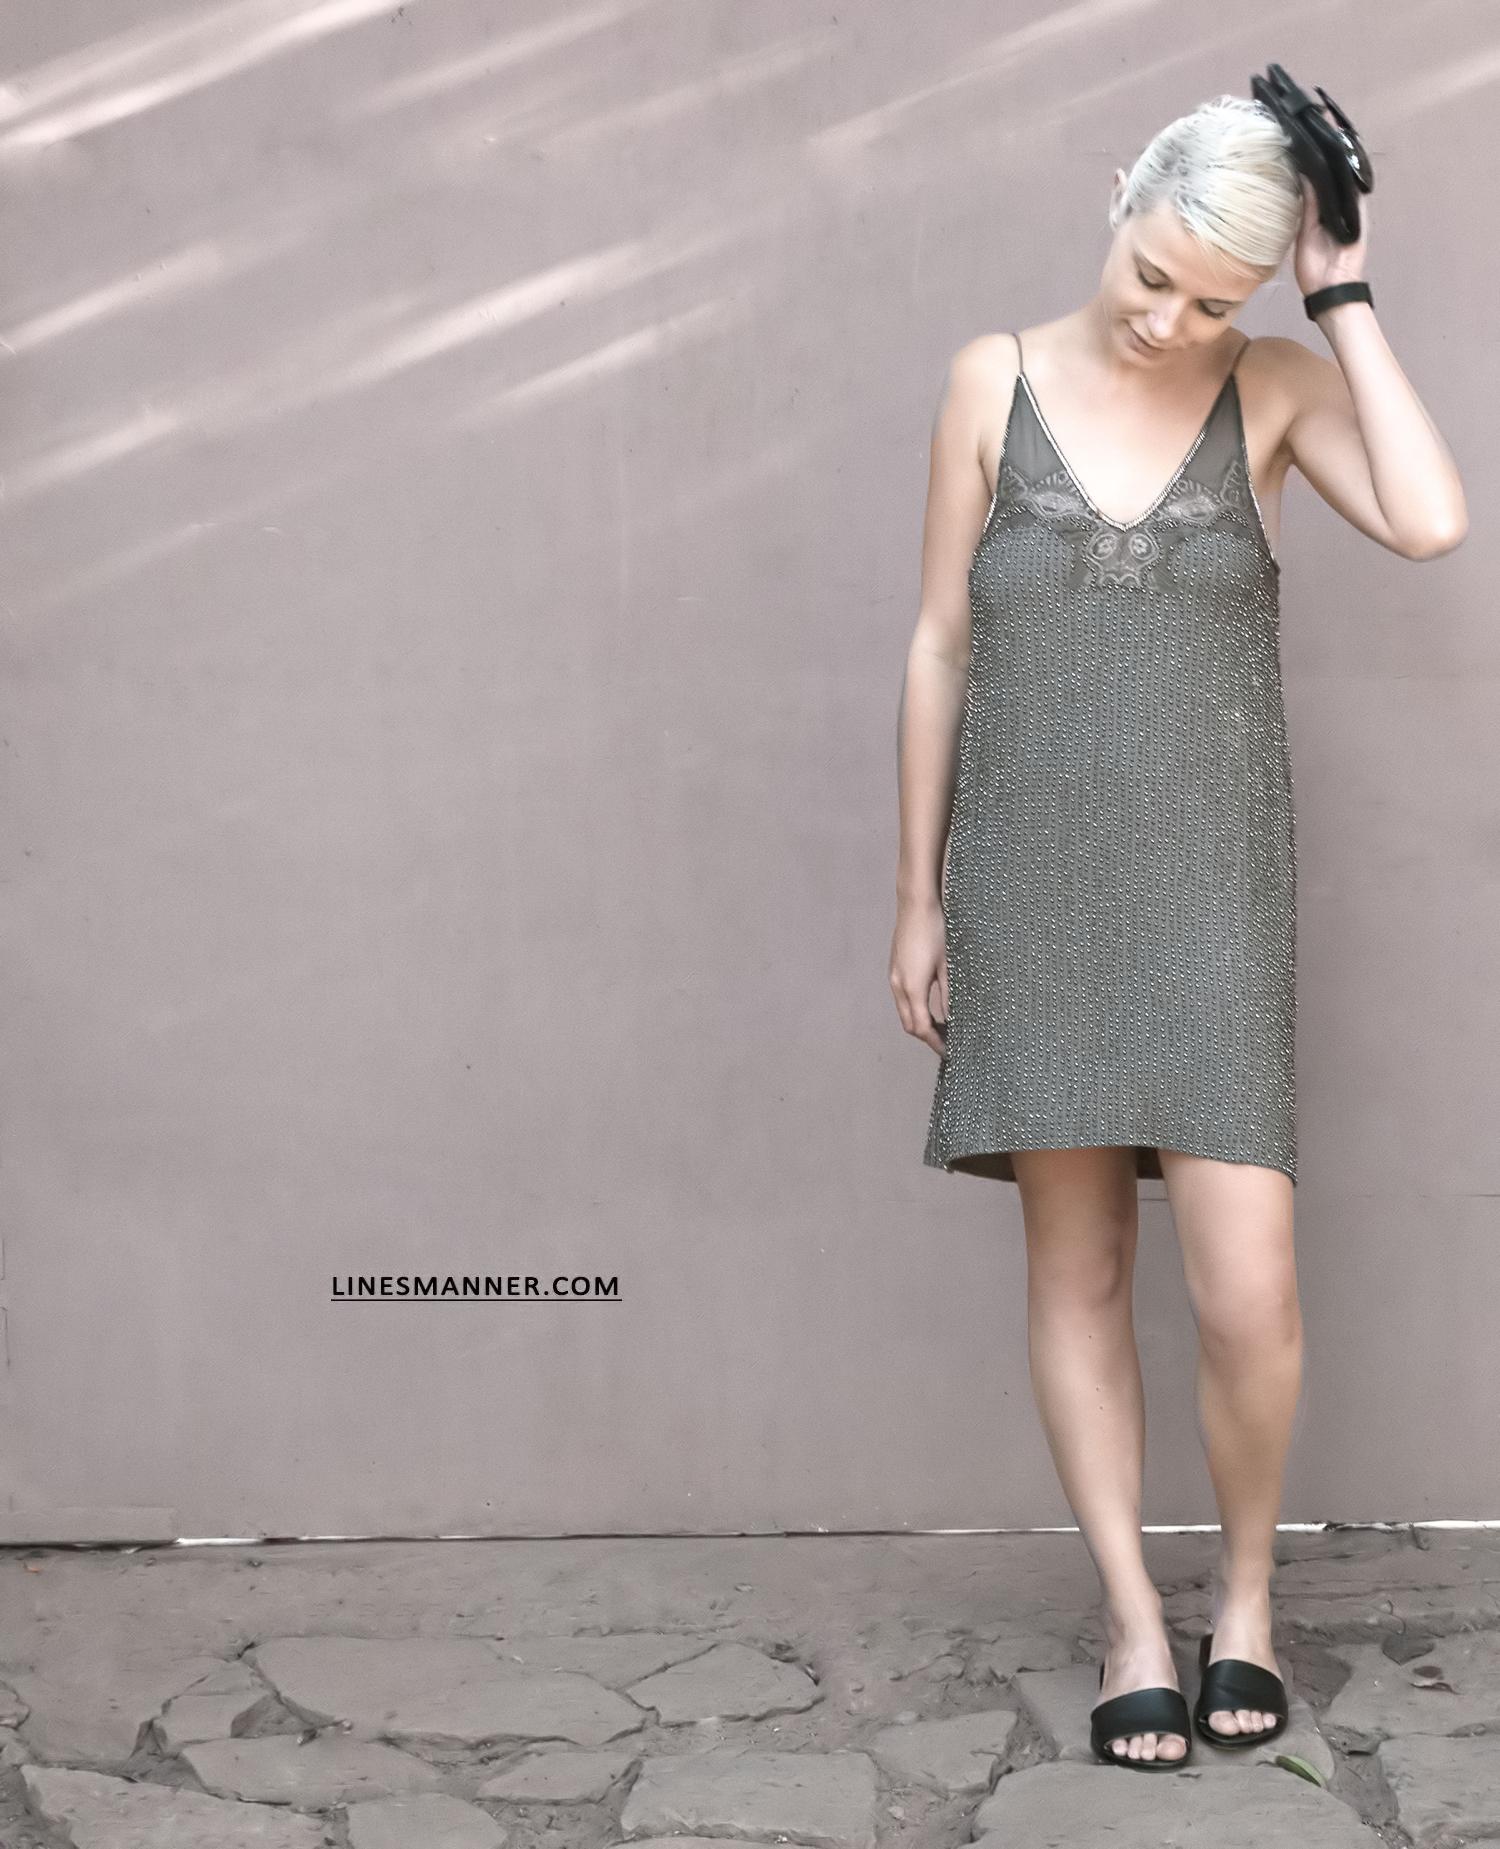 Lines-Manner-Magali_Pascal-Boheme-Chic-Minimalist-Bare_Minimal-Essential-Effortless-Details-Organic-Luxurious-Silk-Dress-Lace-12